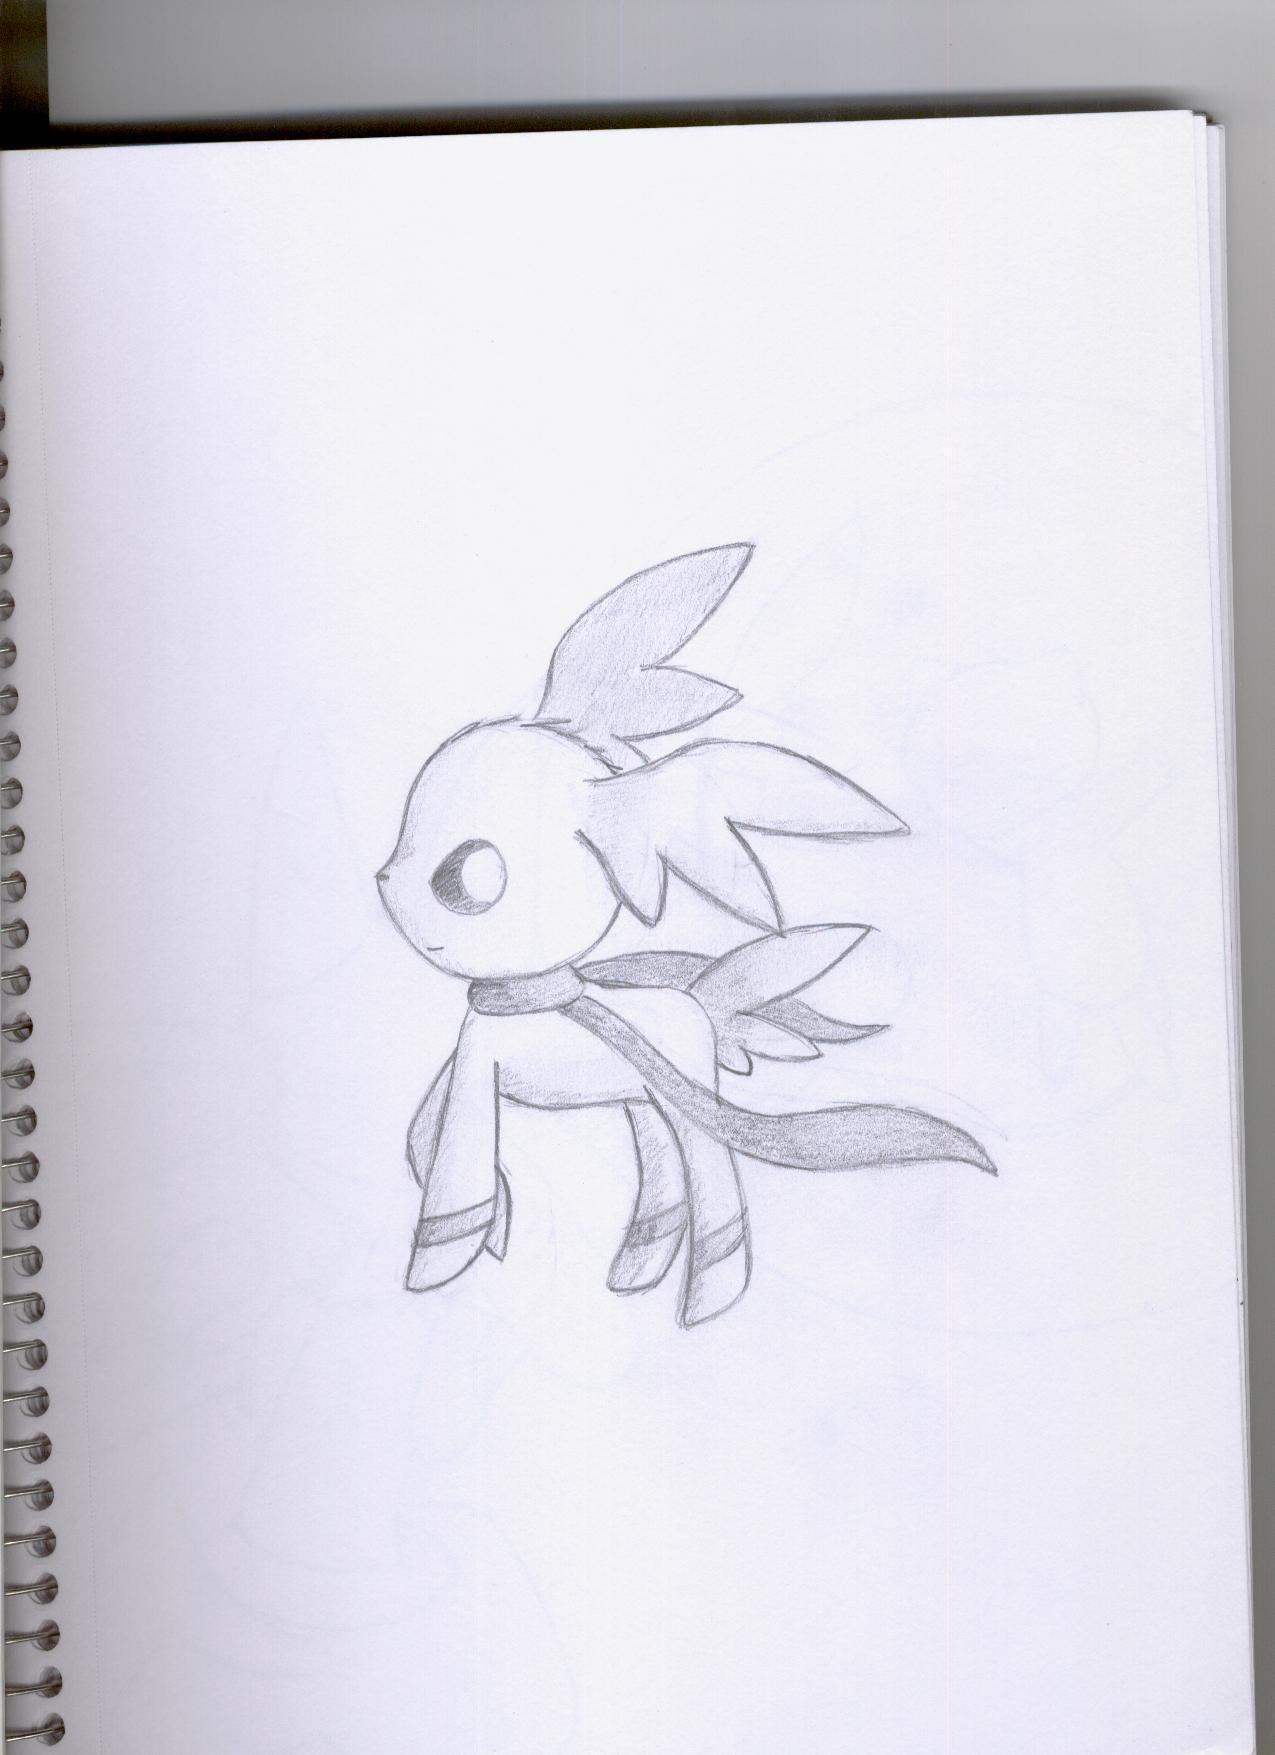 Aireon the flying eevee evolution